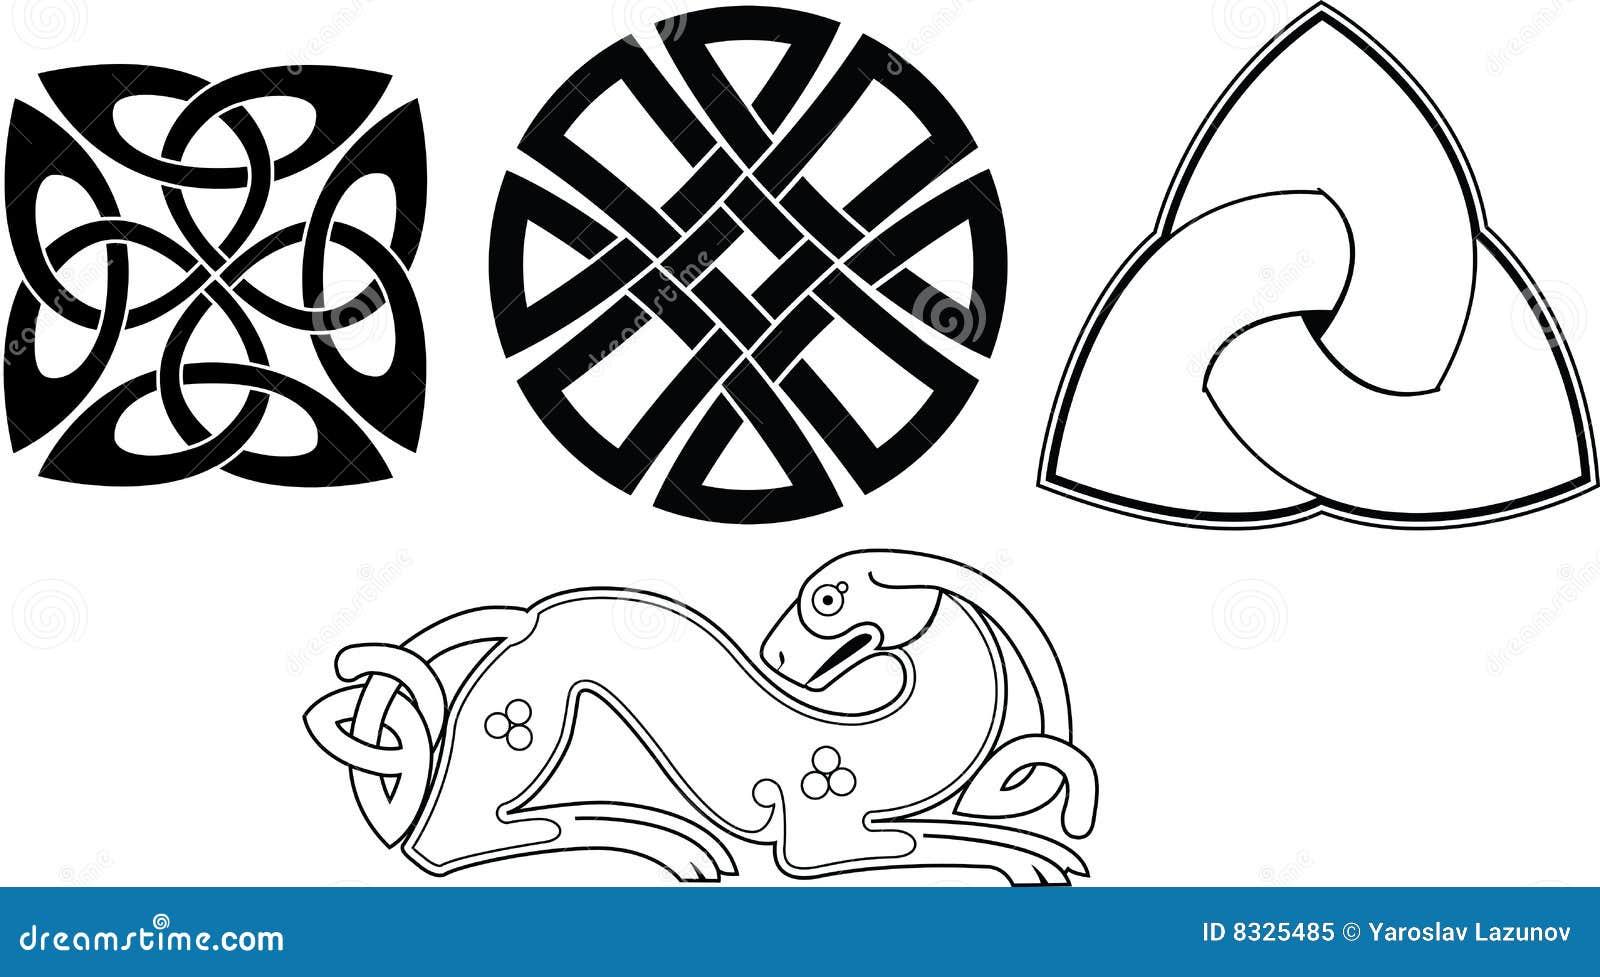 Celtic knot stock vector  Illustration of magic, pattern